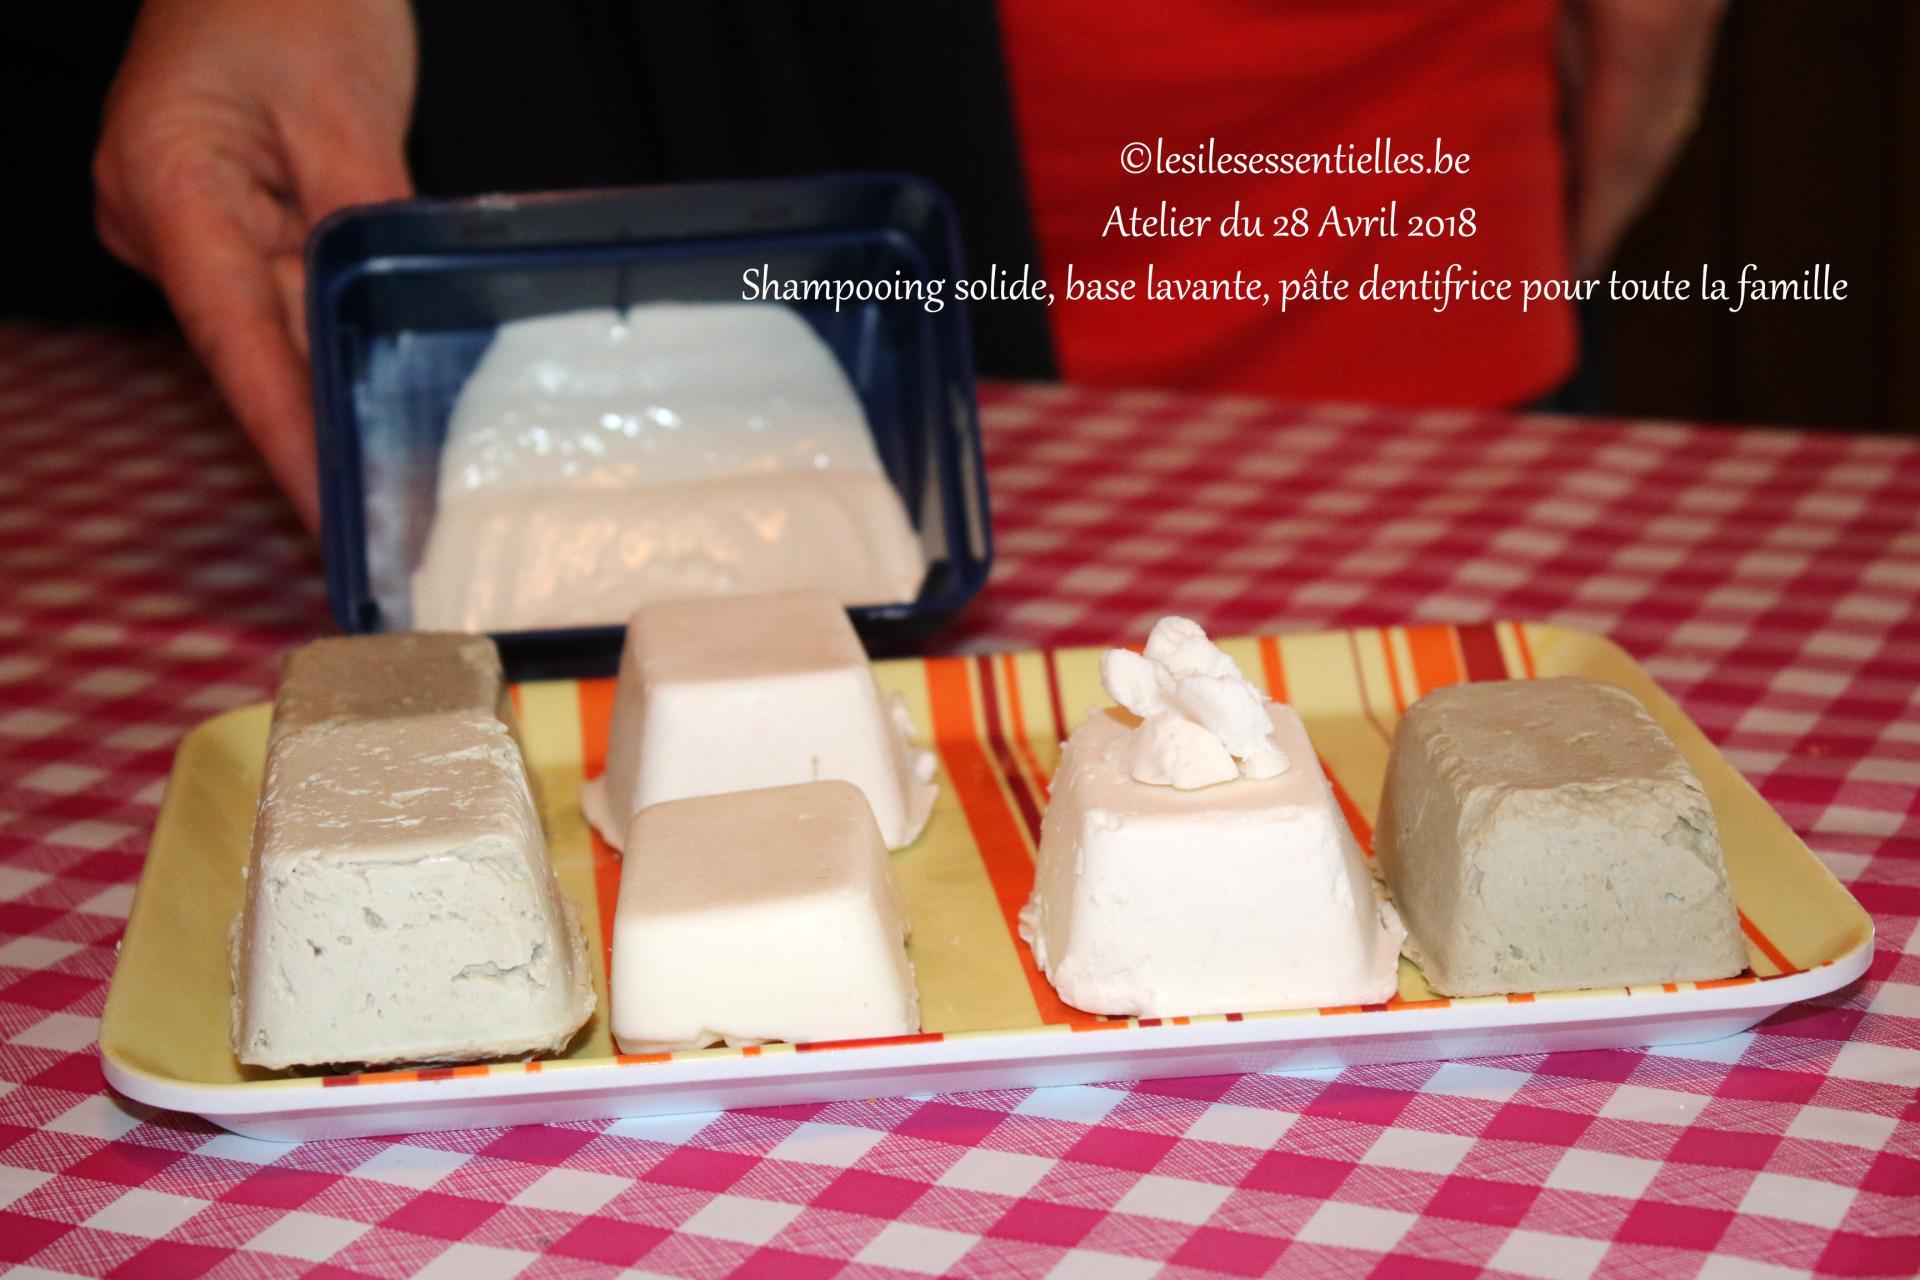 Shampoing solide, base lavante, pâte dentifrice pour toute la famille